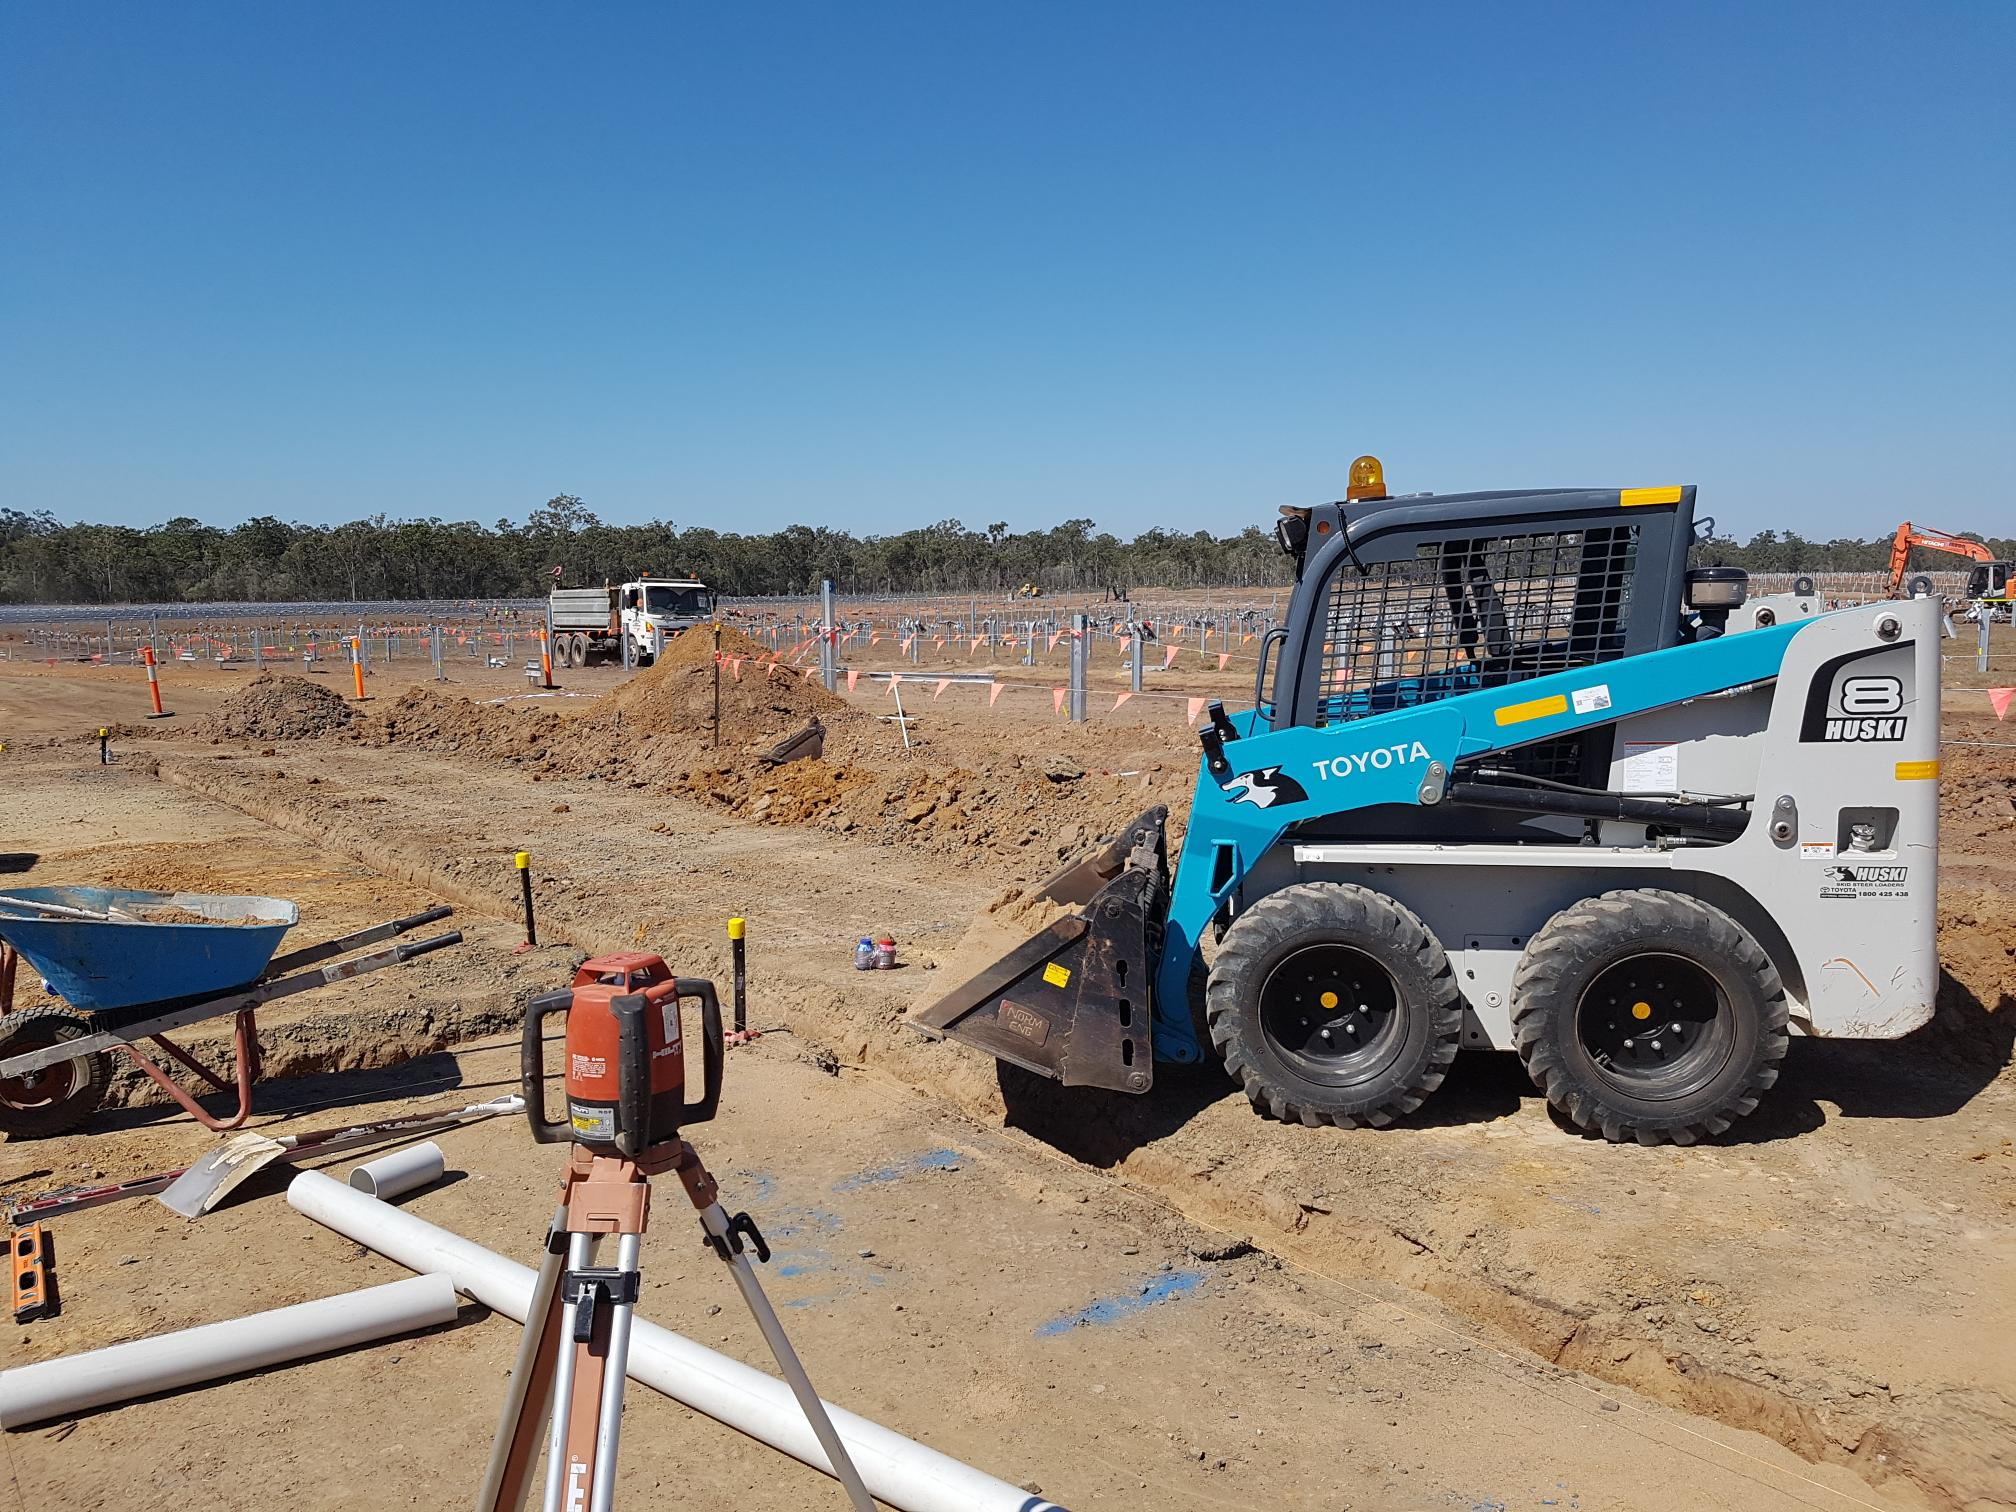 Civil Plumbing and Drainage